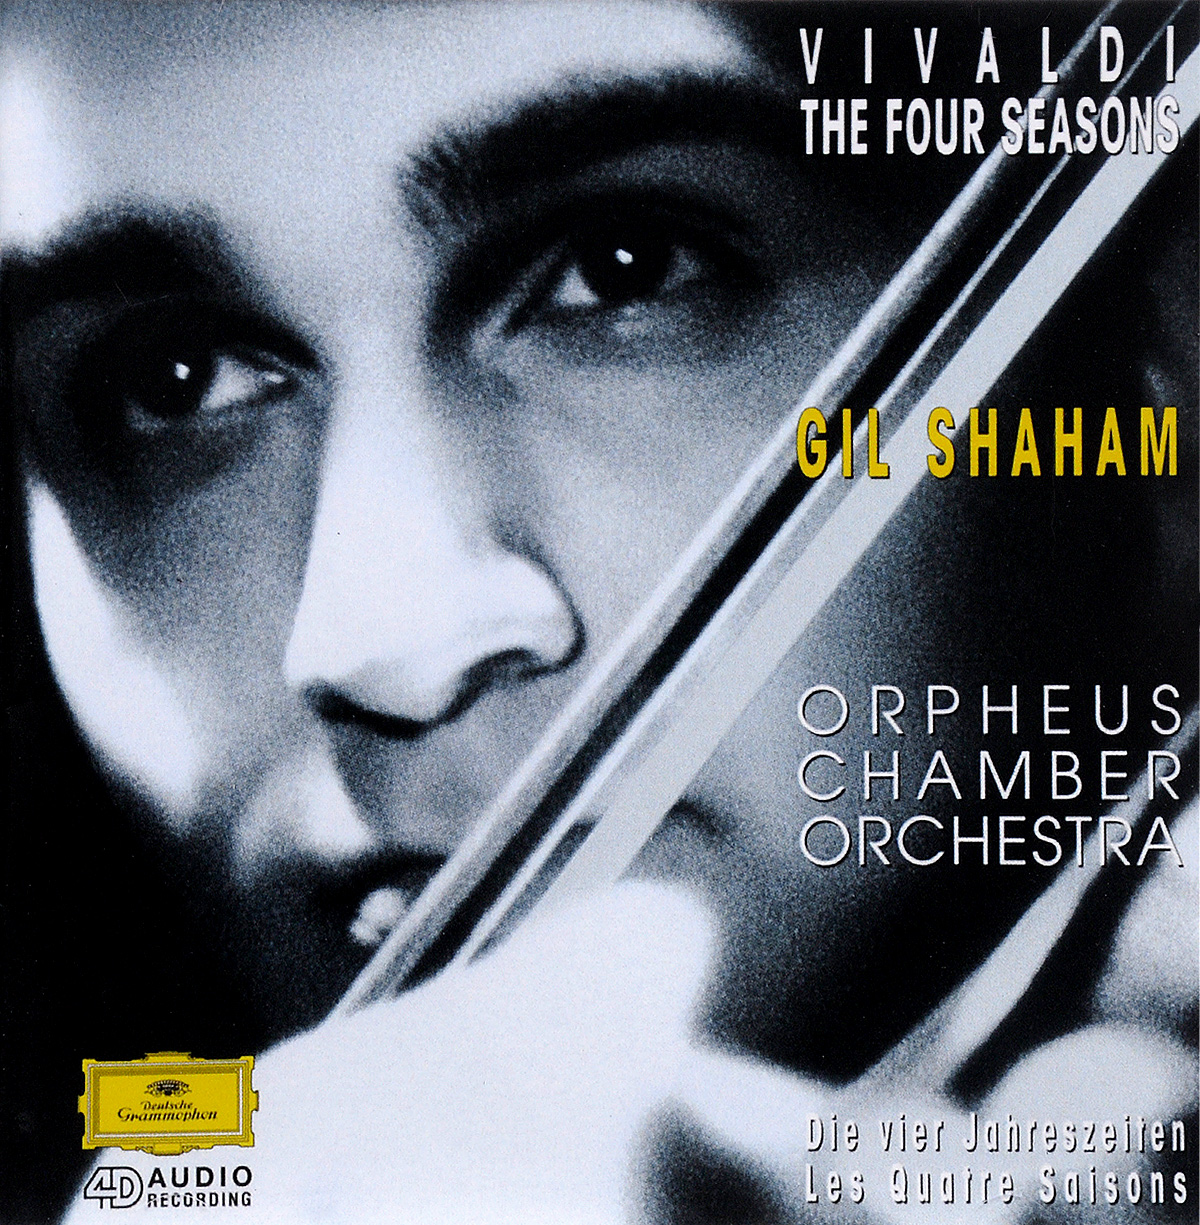 цена Гил Шахам,Orpheus Chamber Orchestra Gil Shaham, Orpheus Chamber Orchestra. Vivaldi. Die Vier Janreszeiten Les Quatre Saisons онлайн в 2017 году